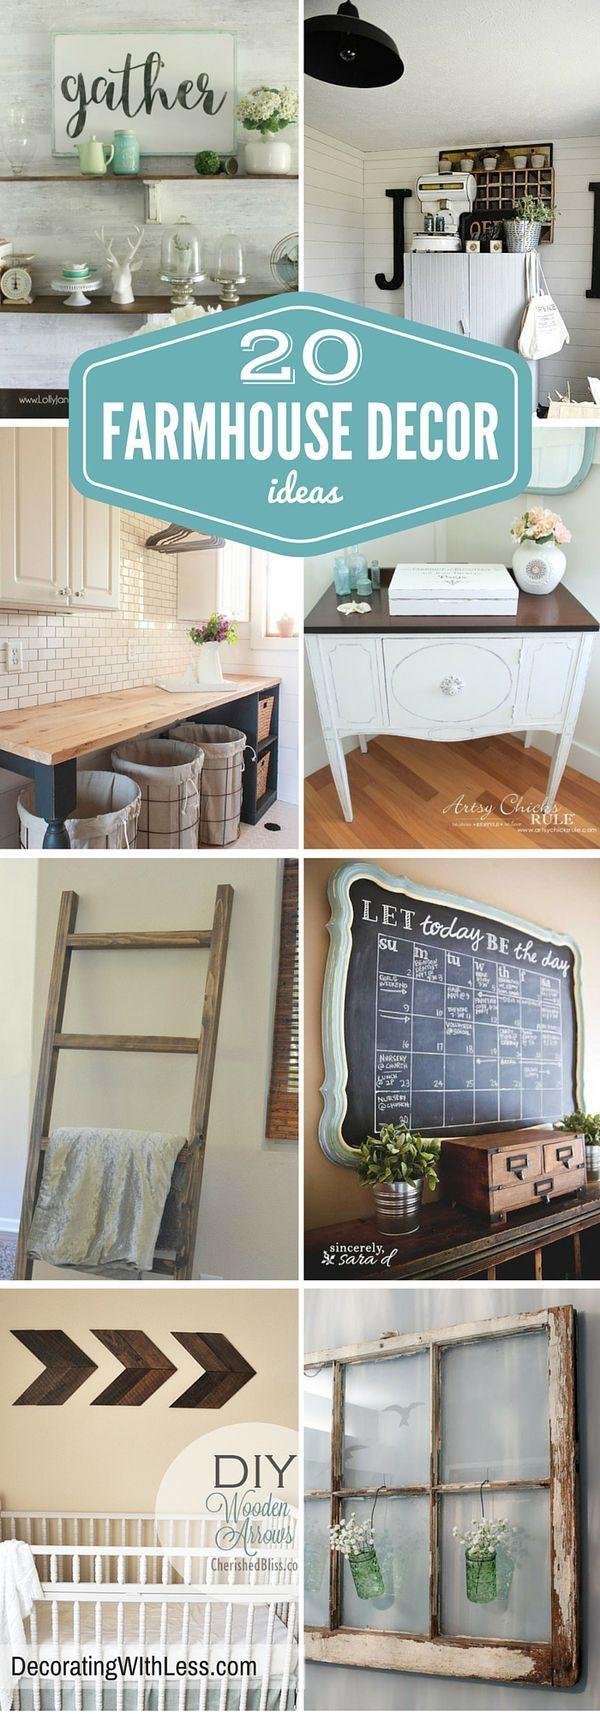 best Farmhouse Style images on Pinterest Beam ceilings